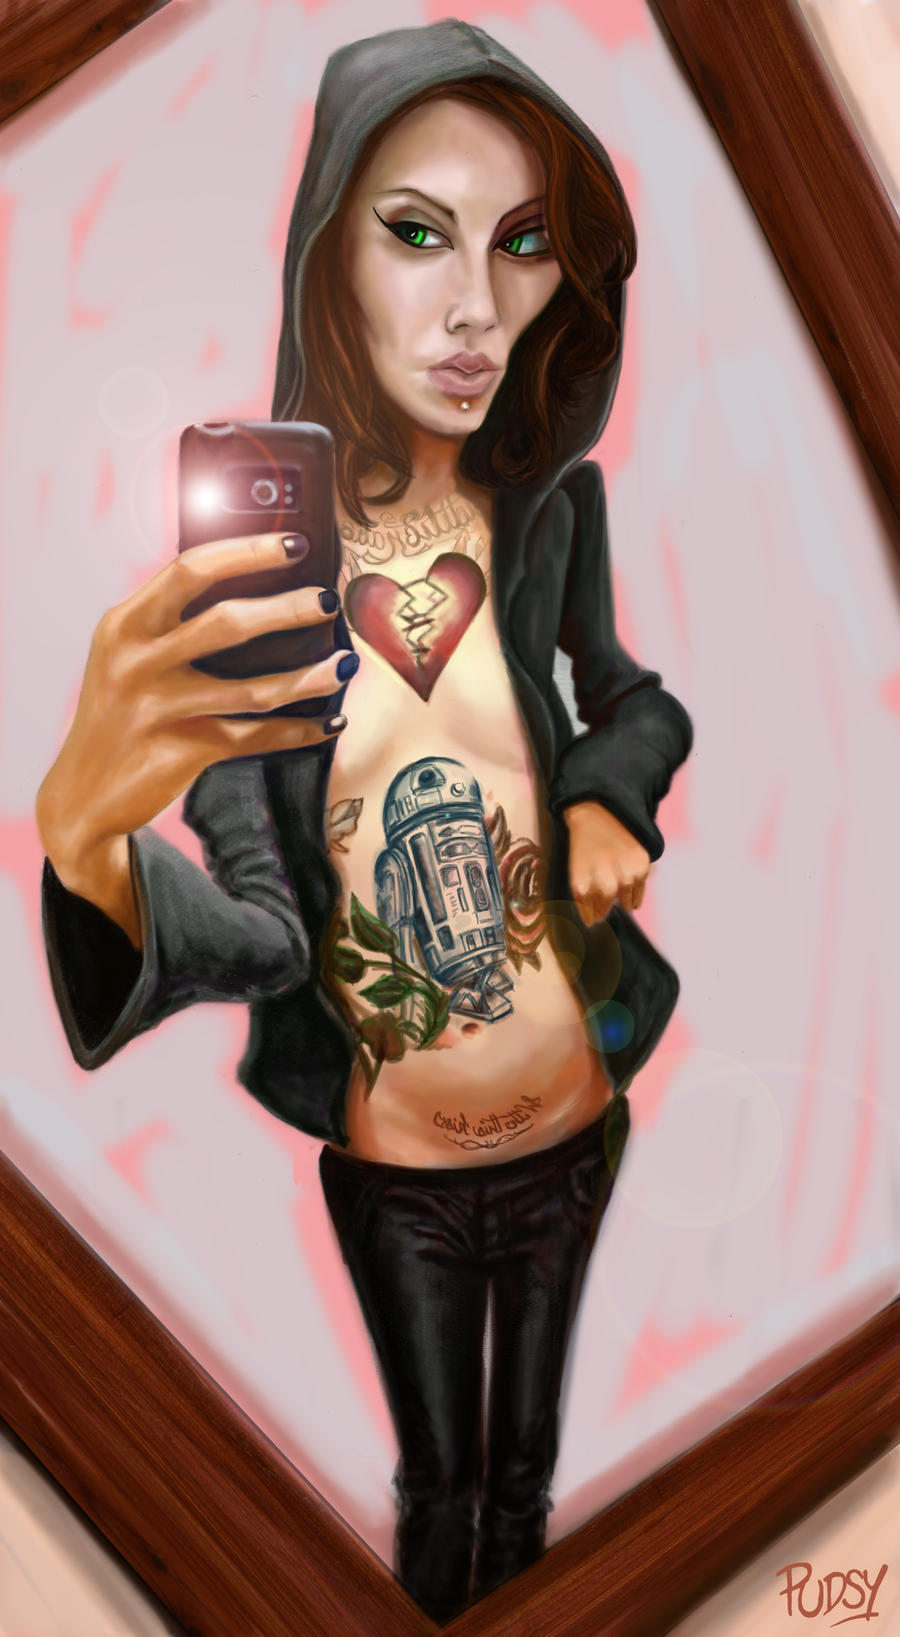 Tattoo Liz - Take 3 by Pudsybear